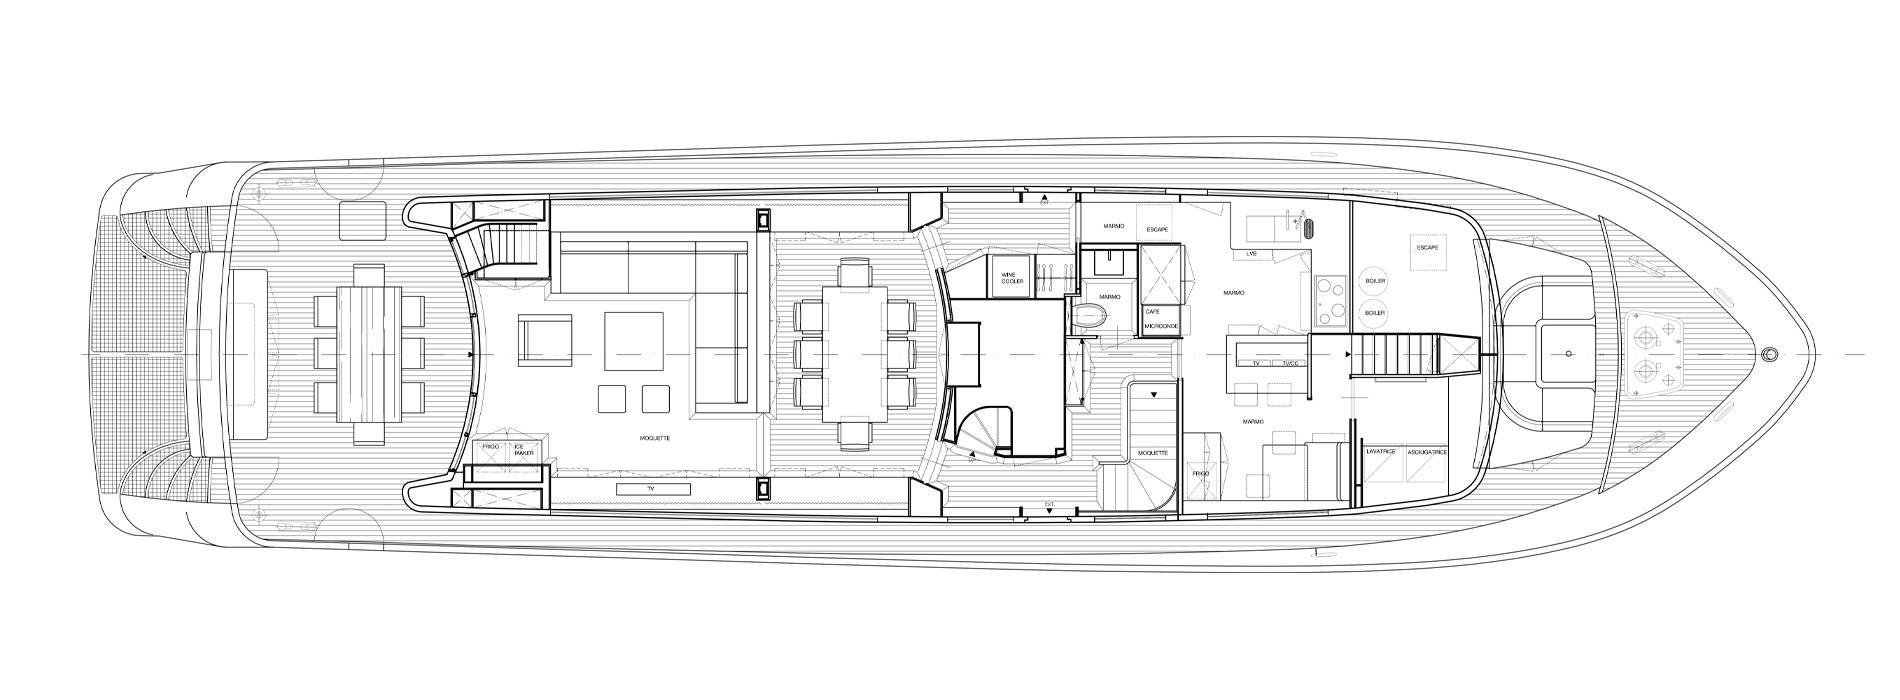 Sanlorenzo Yachts SL88-541 Pont principal